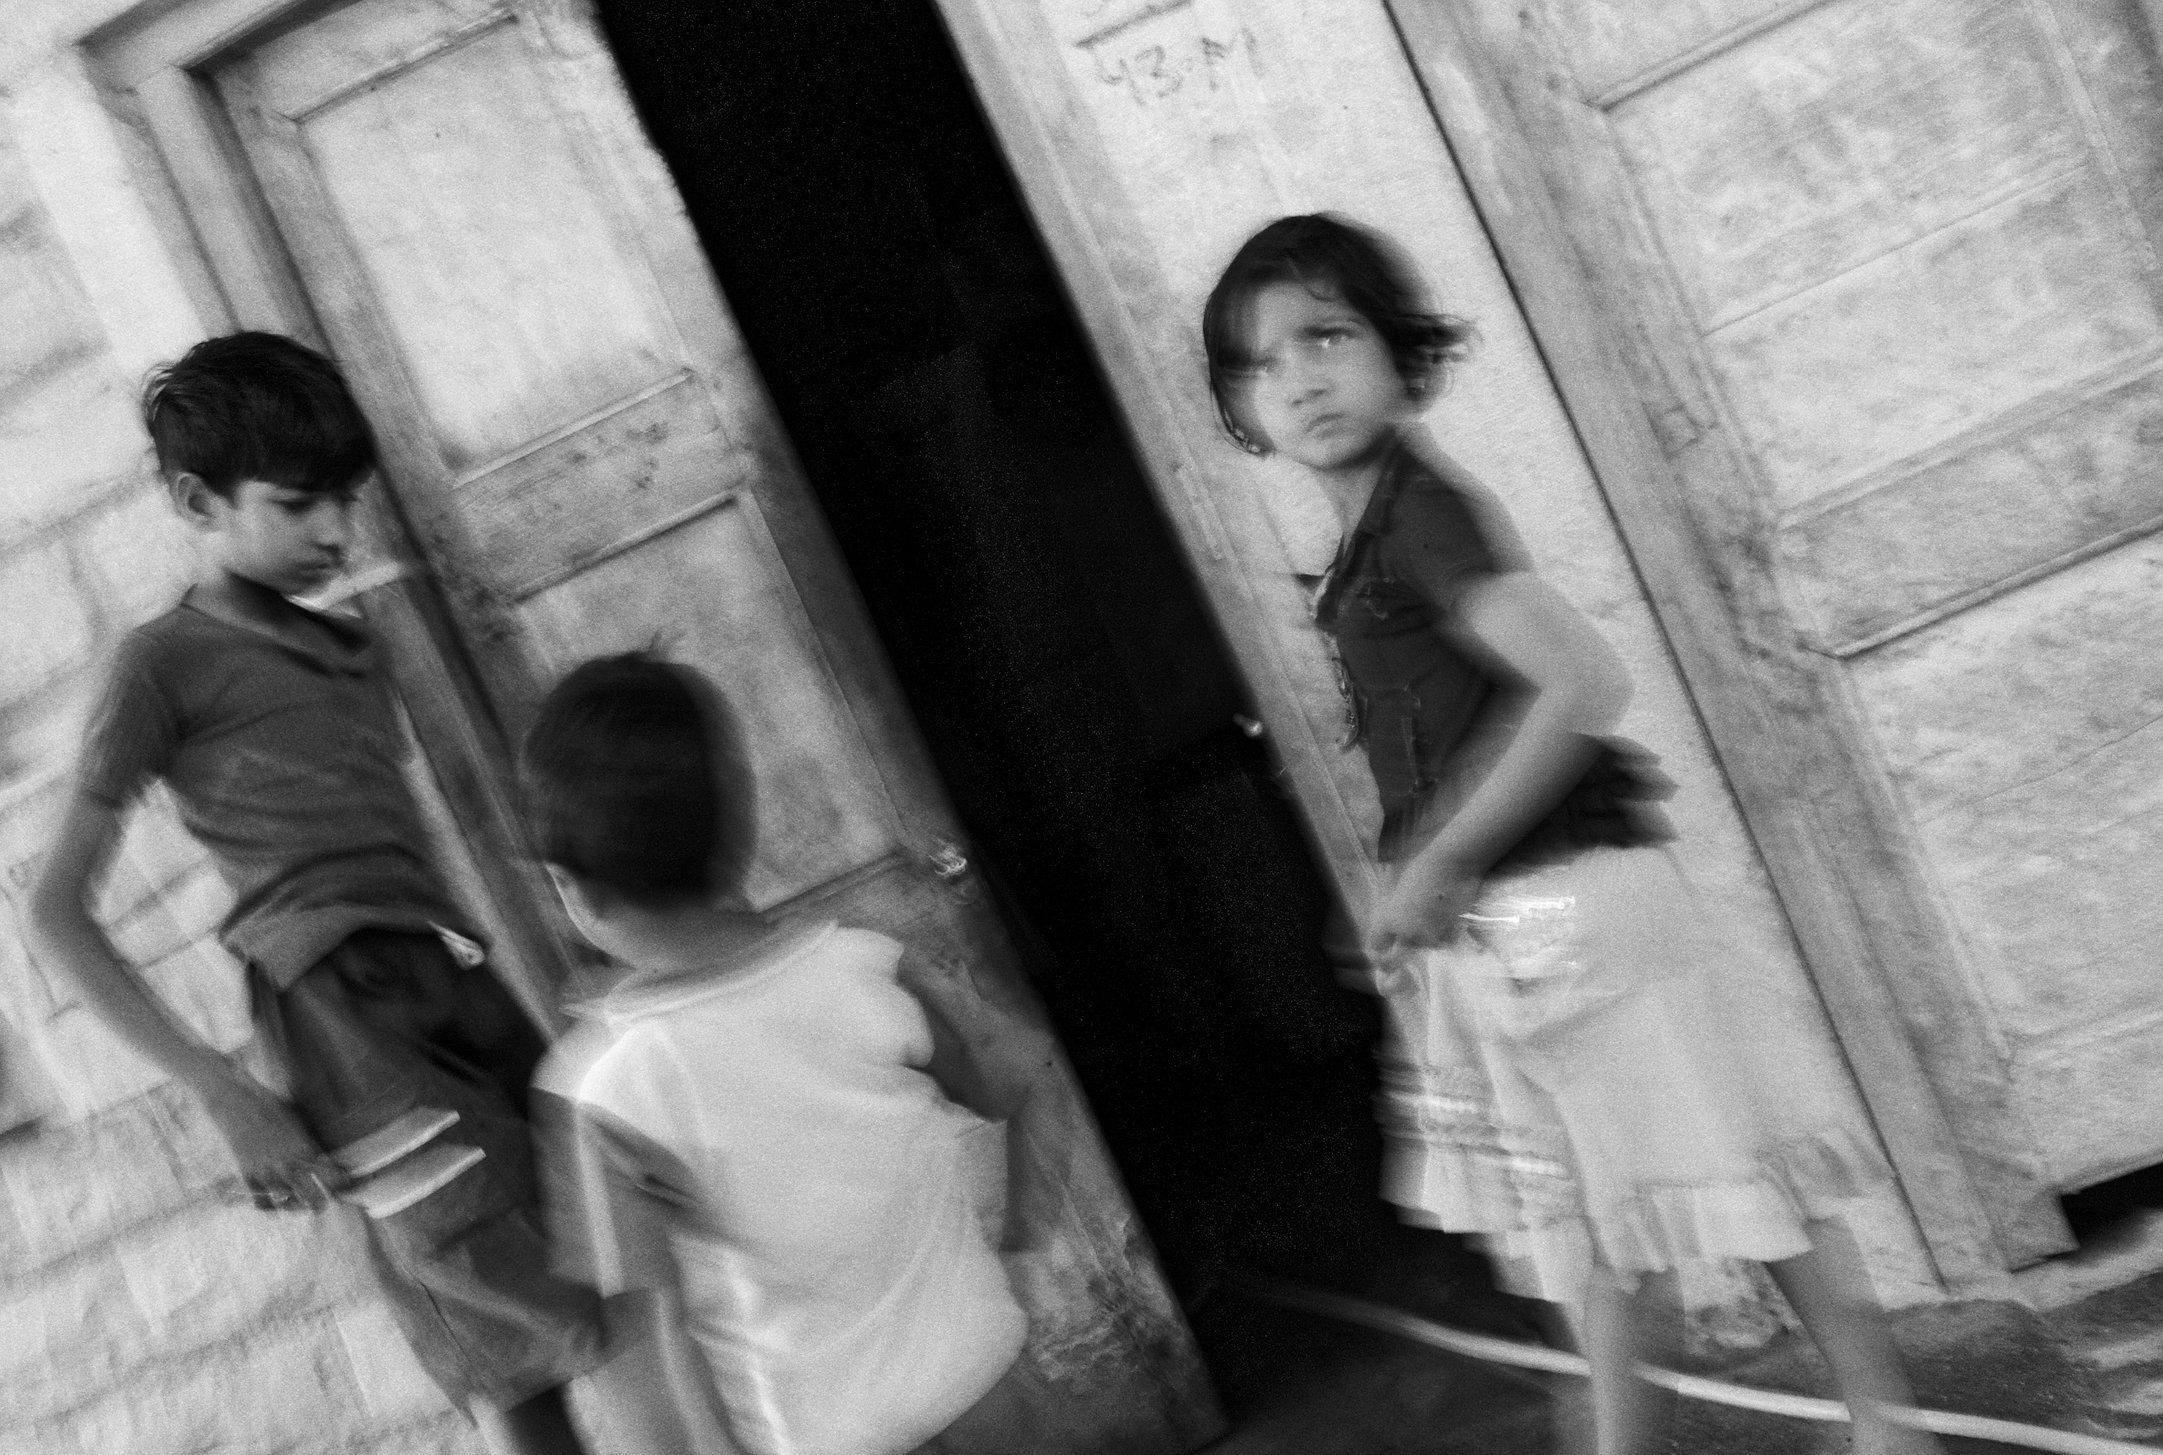 Jodhpur, India, 2010